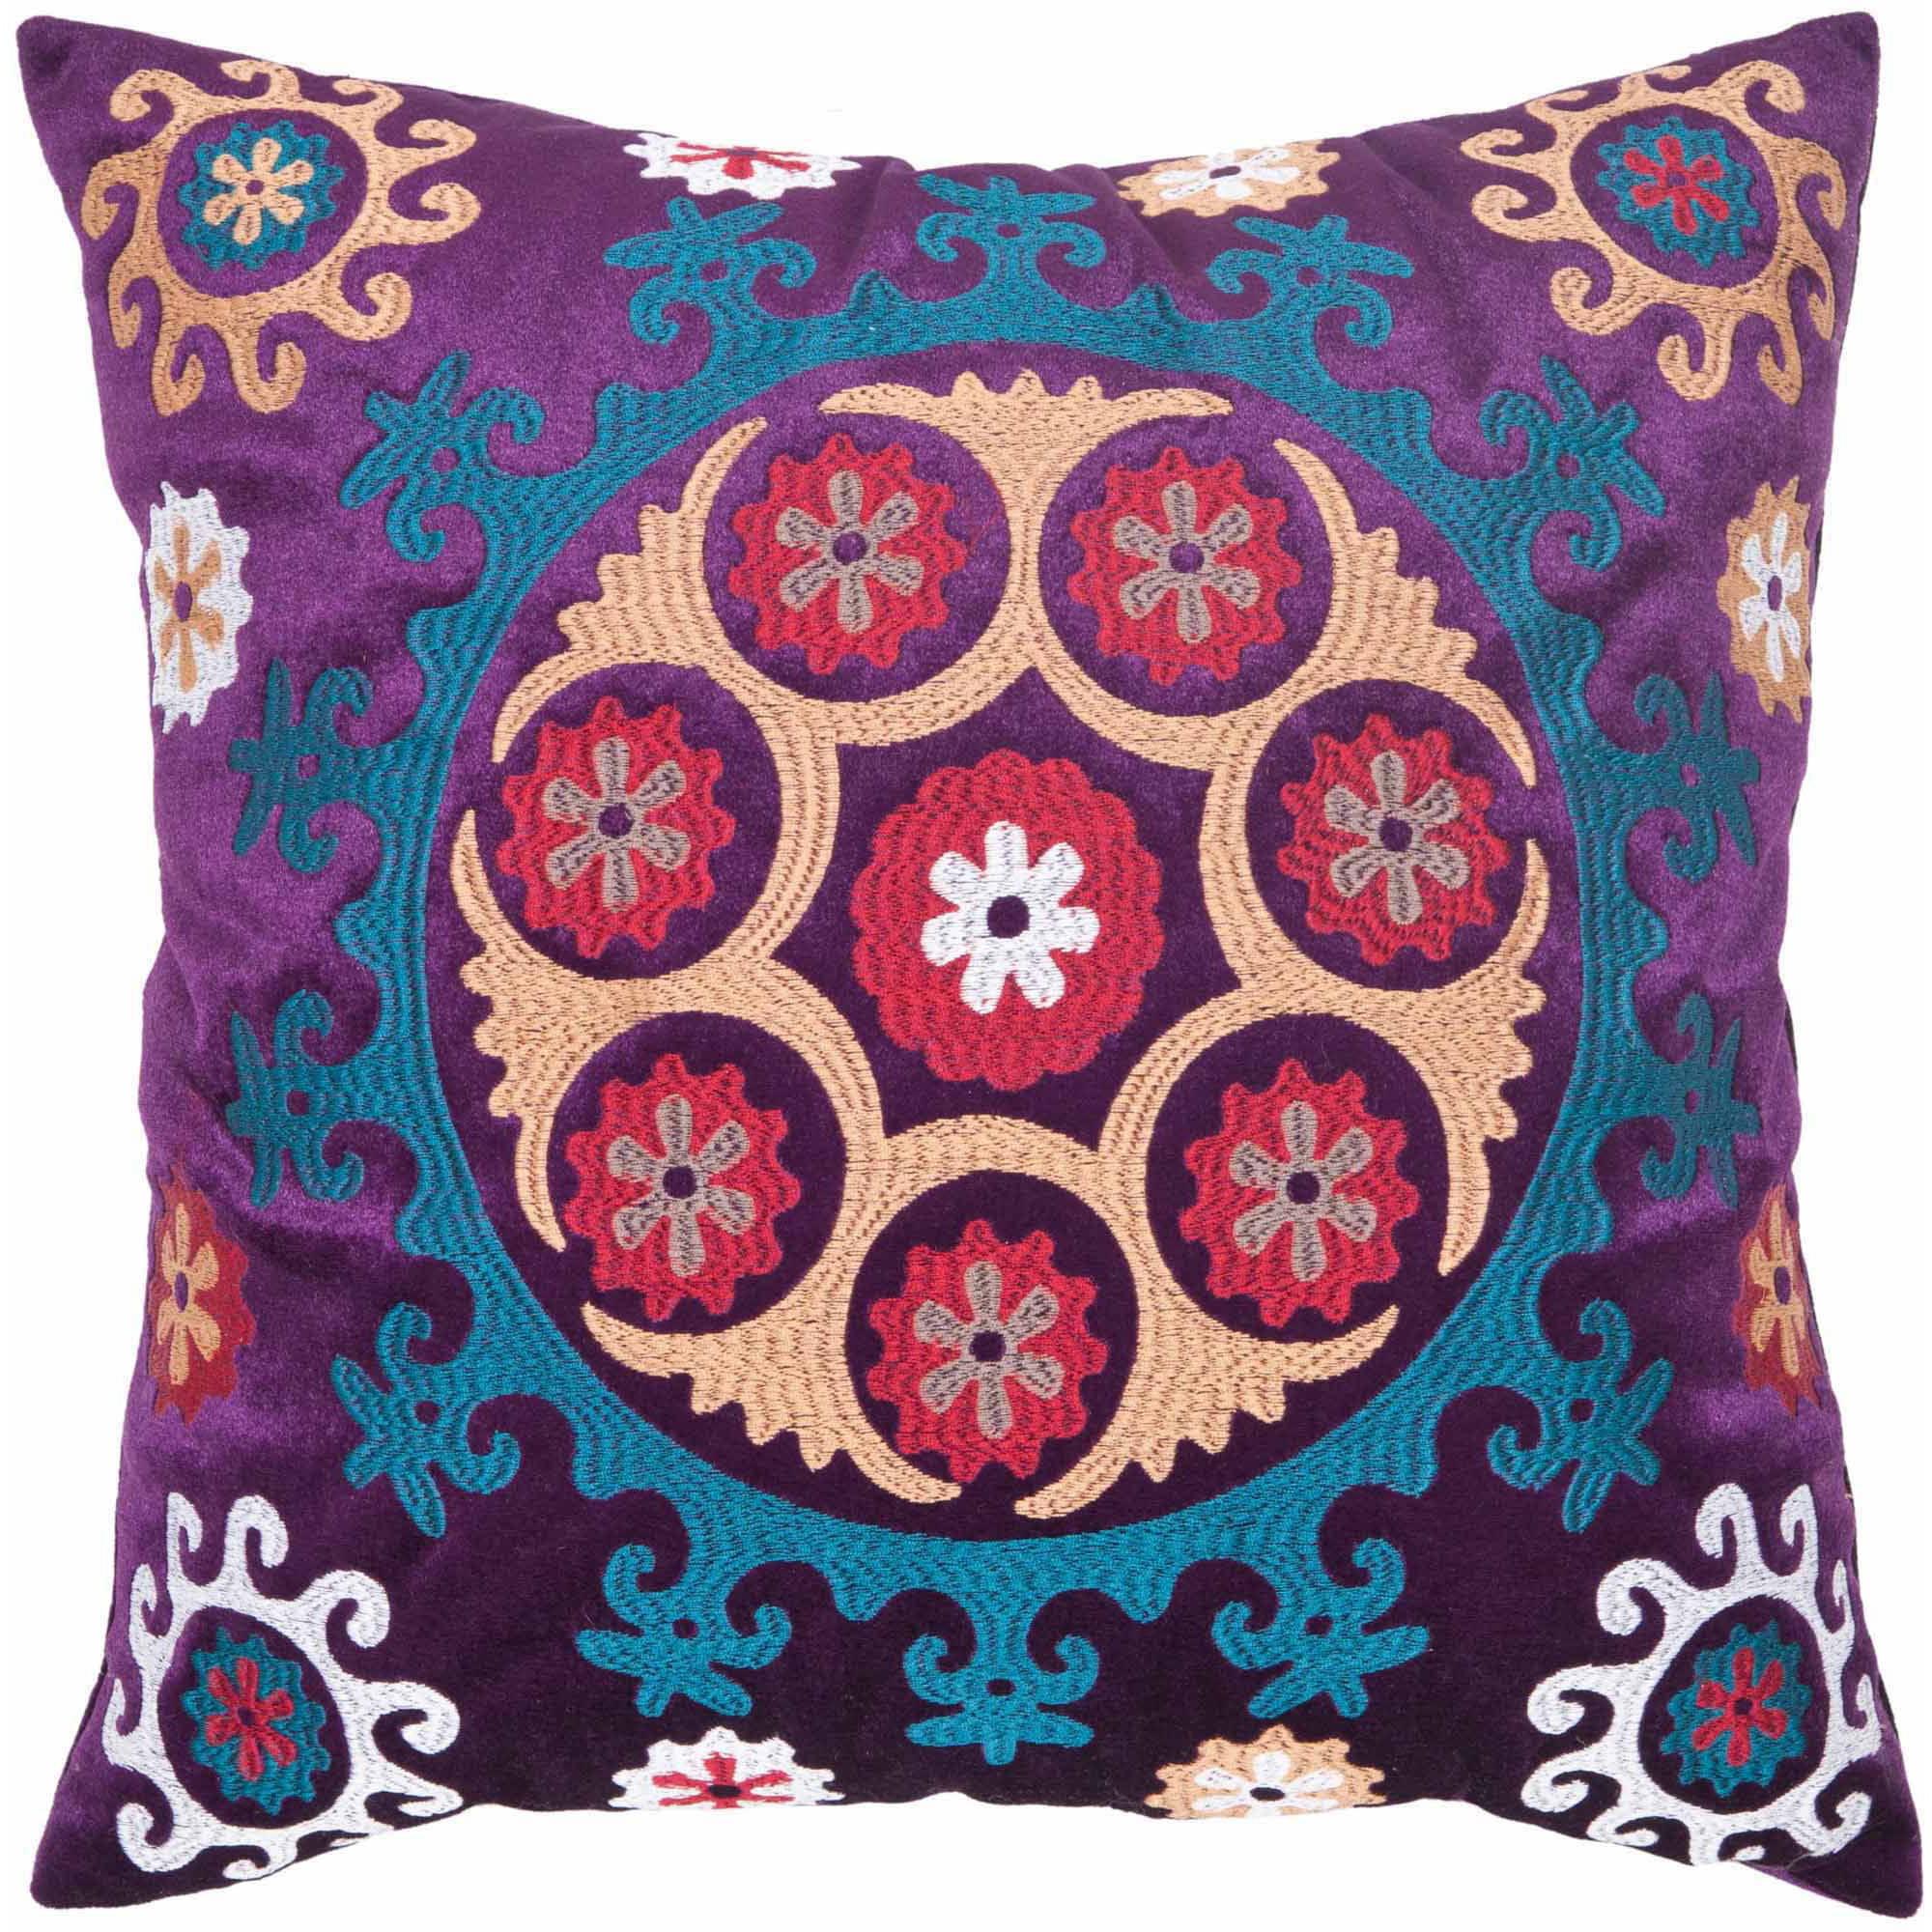 Safavieh Gold/Purple Vanessa Pillow, Set of 2